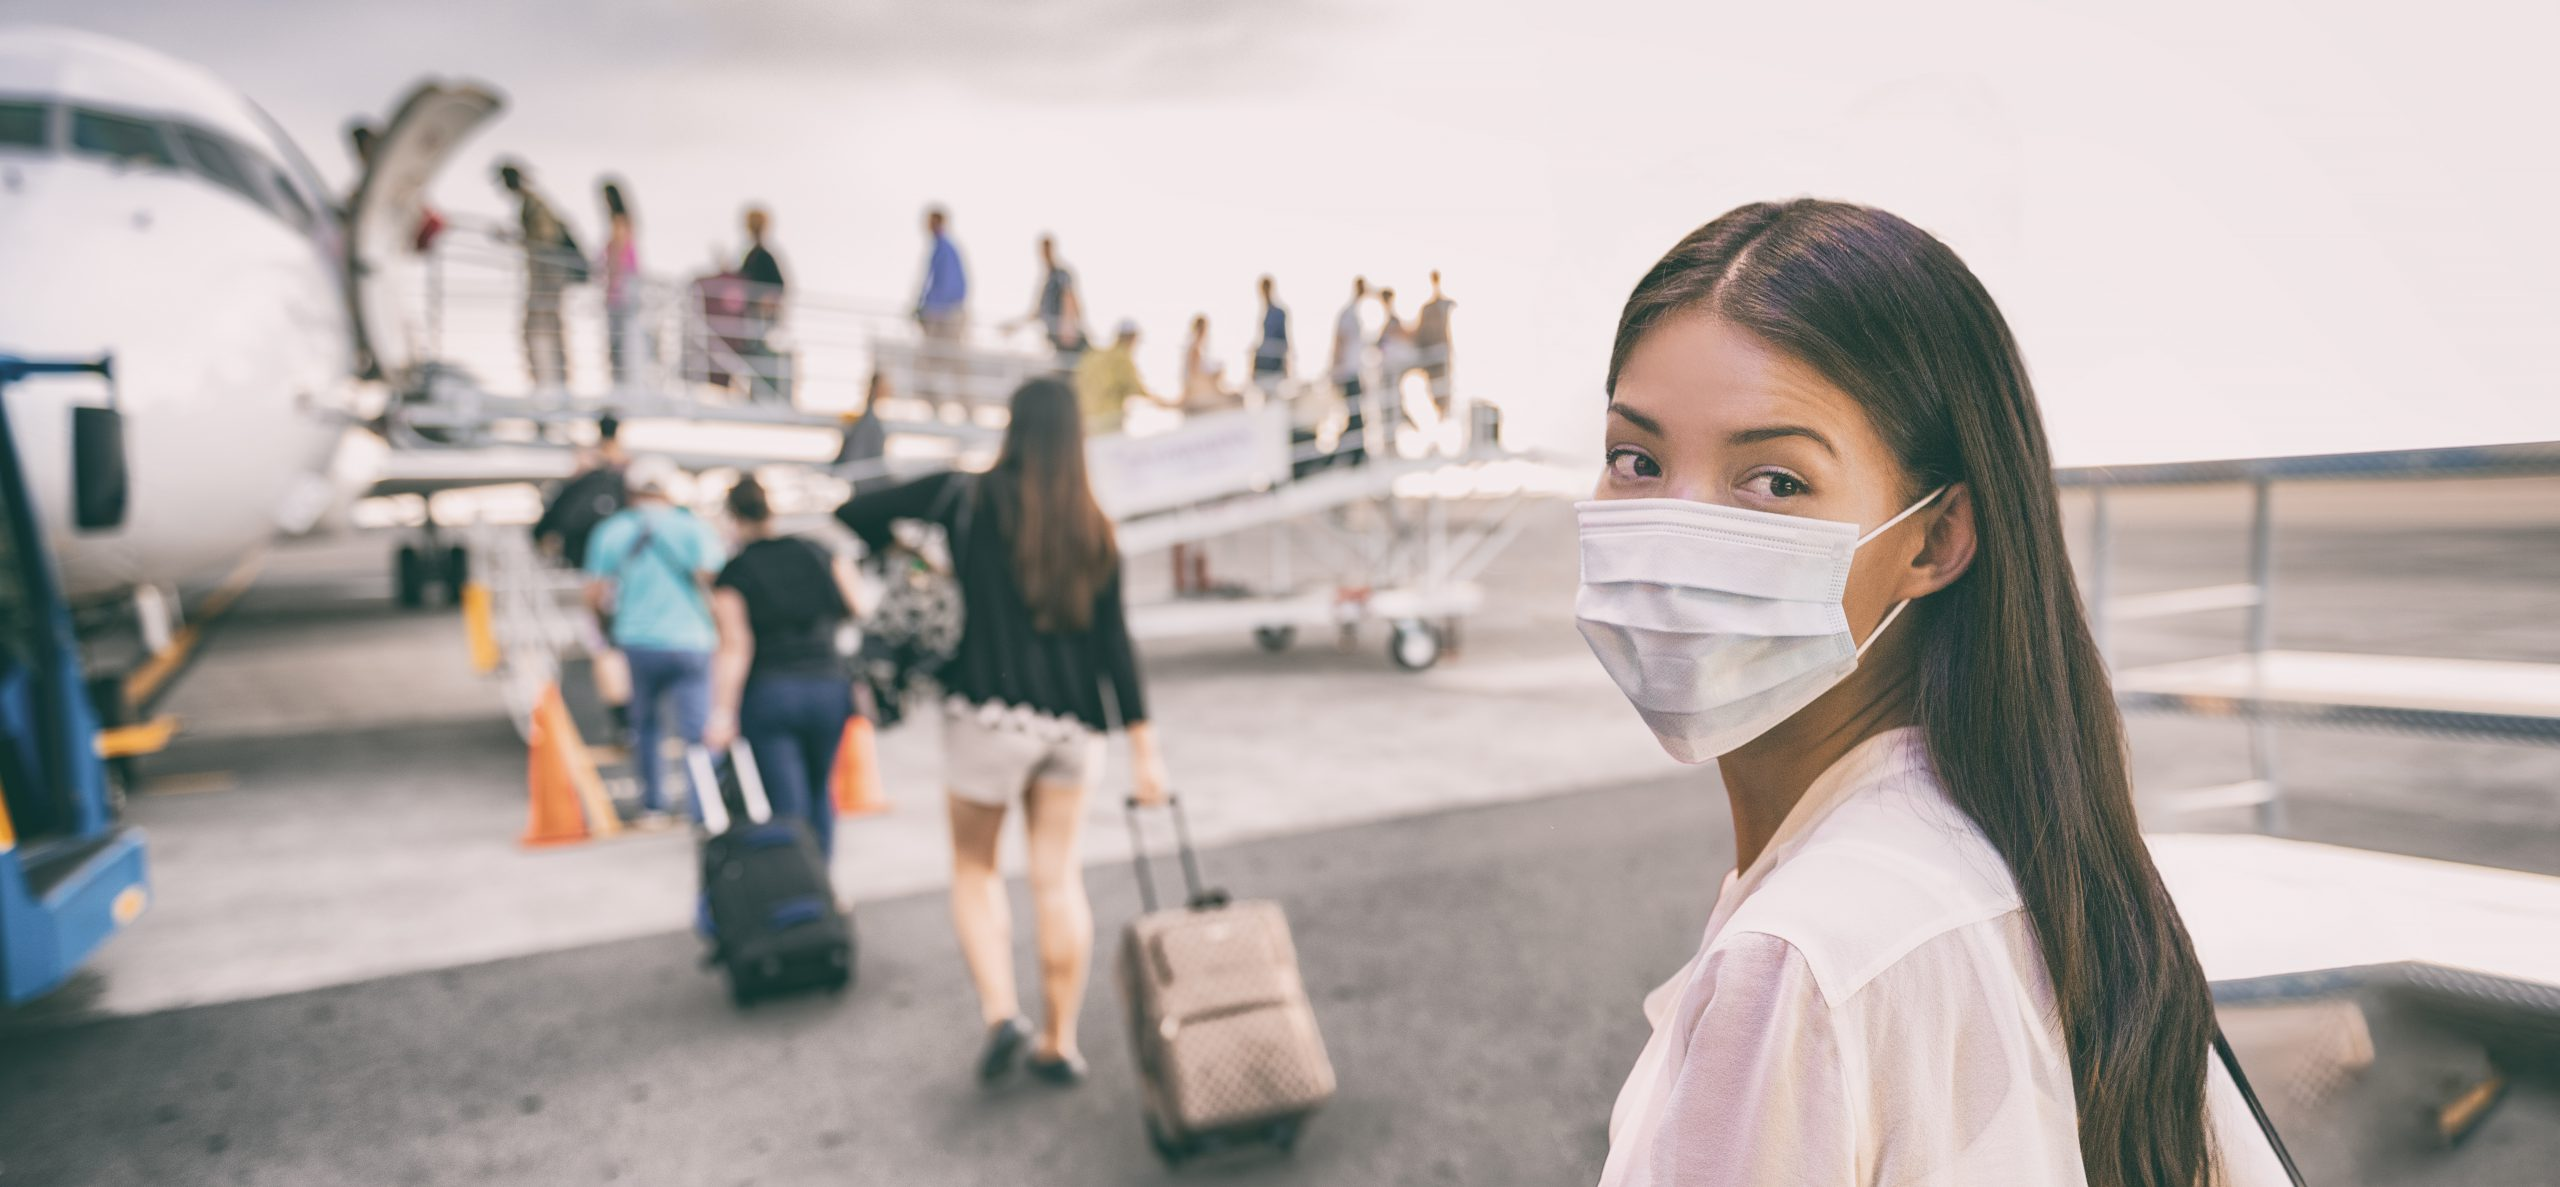 coronavirus on plane